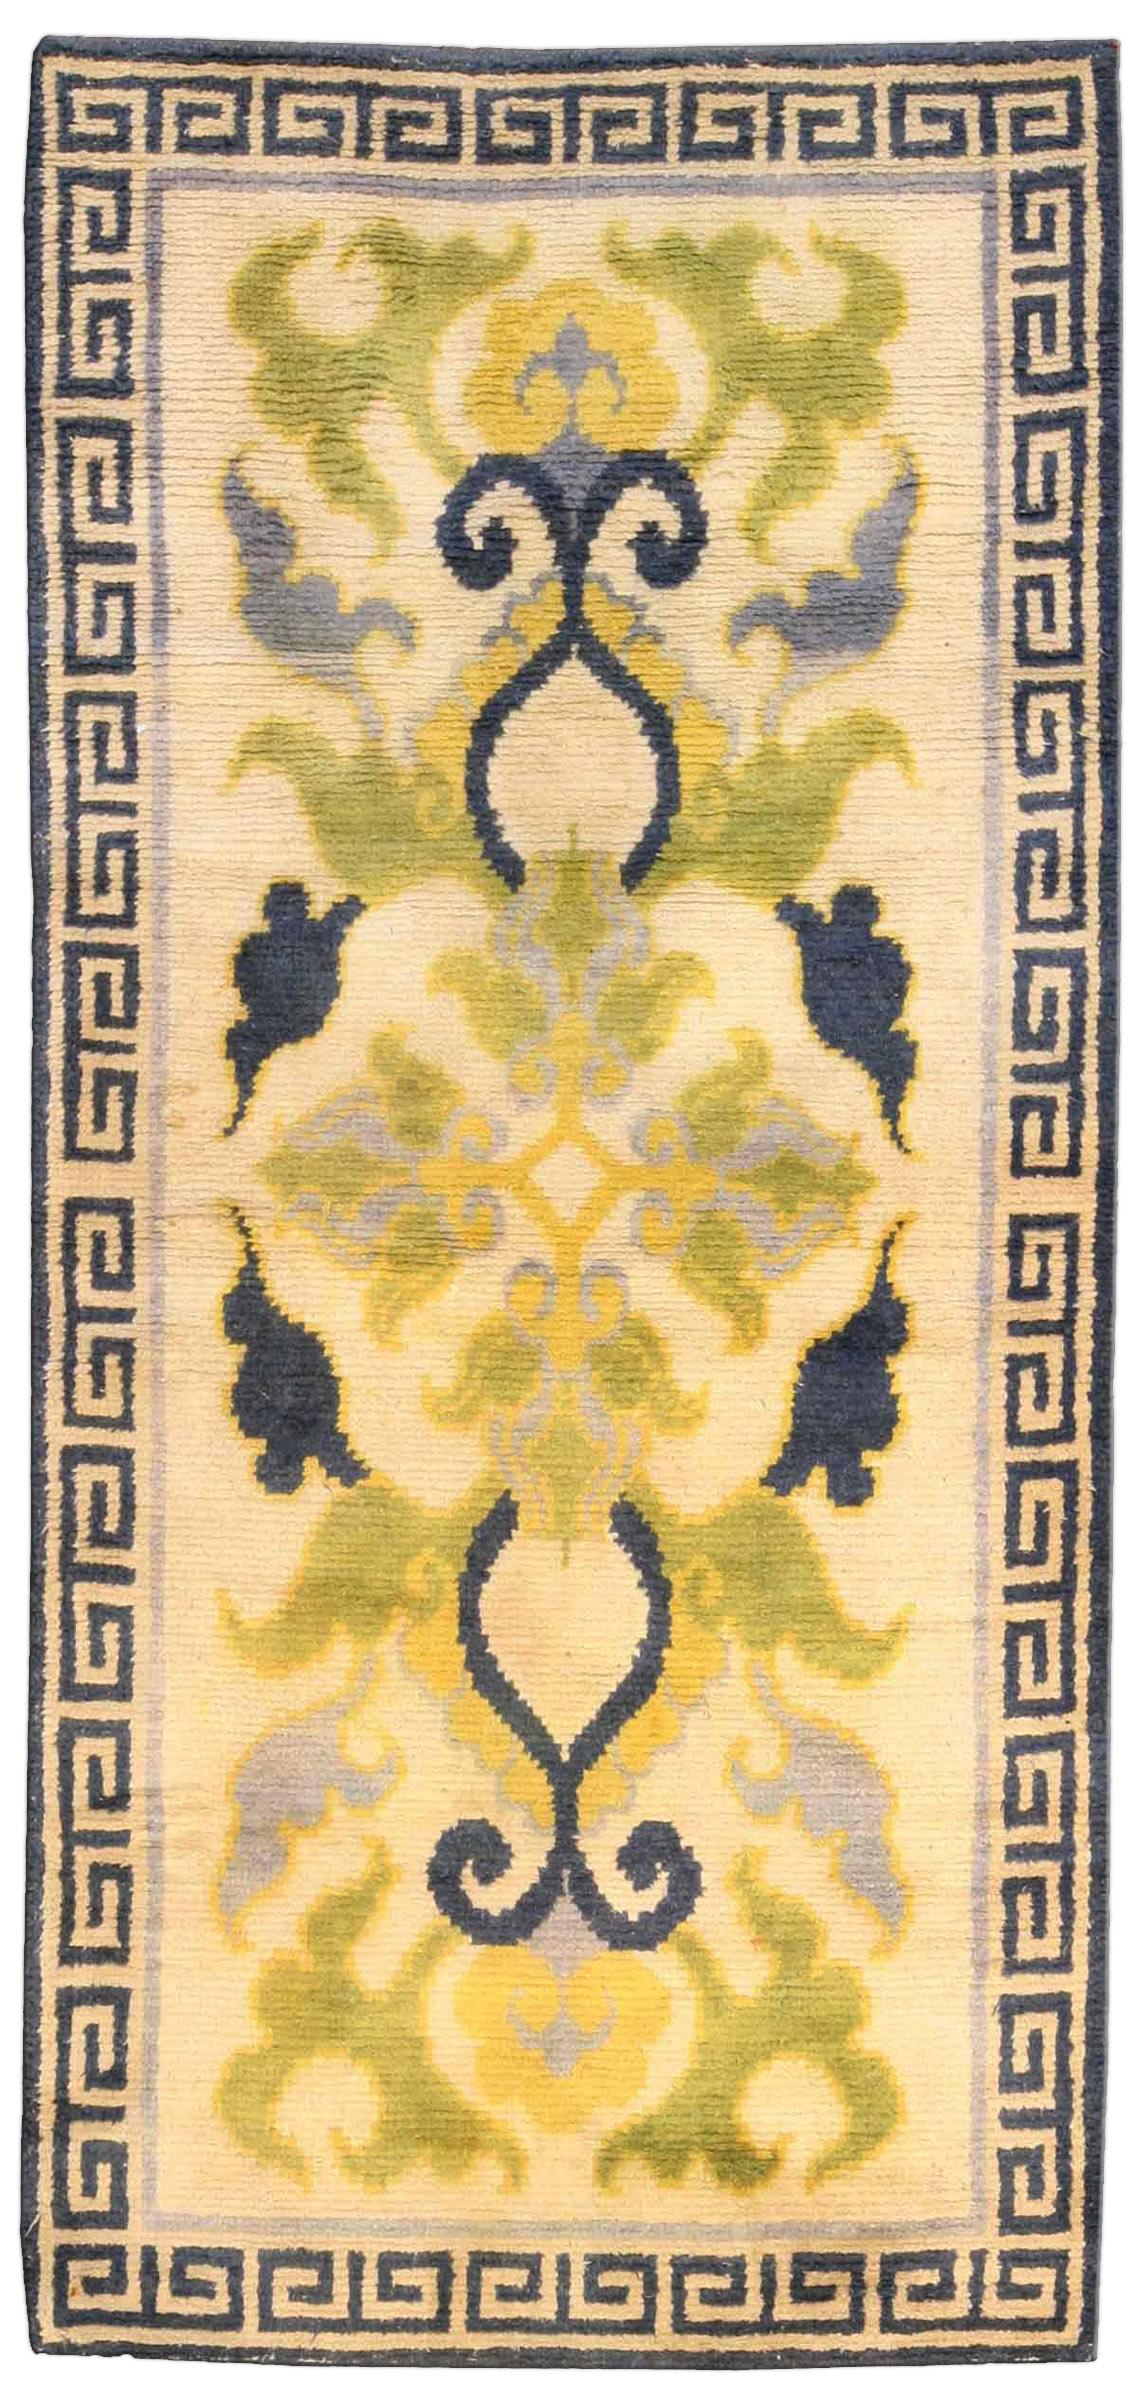 Vintage Japanese Rug BB3958